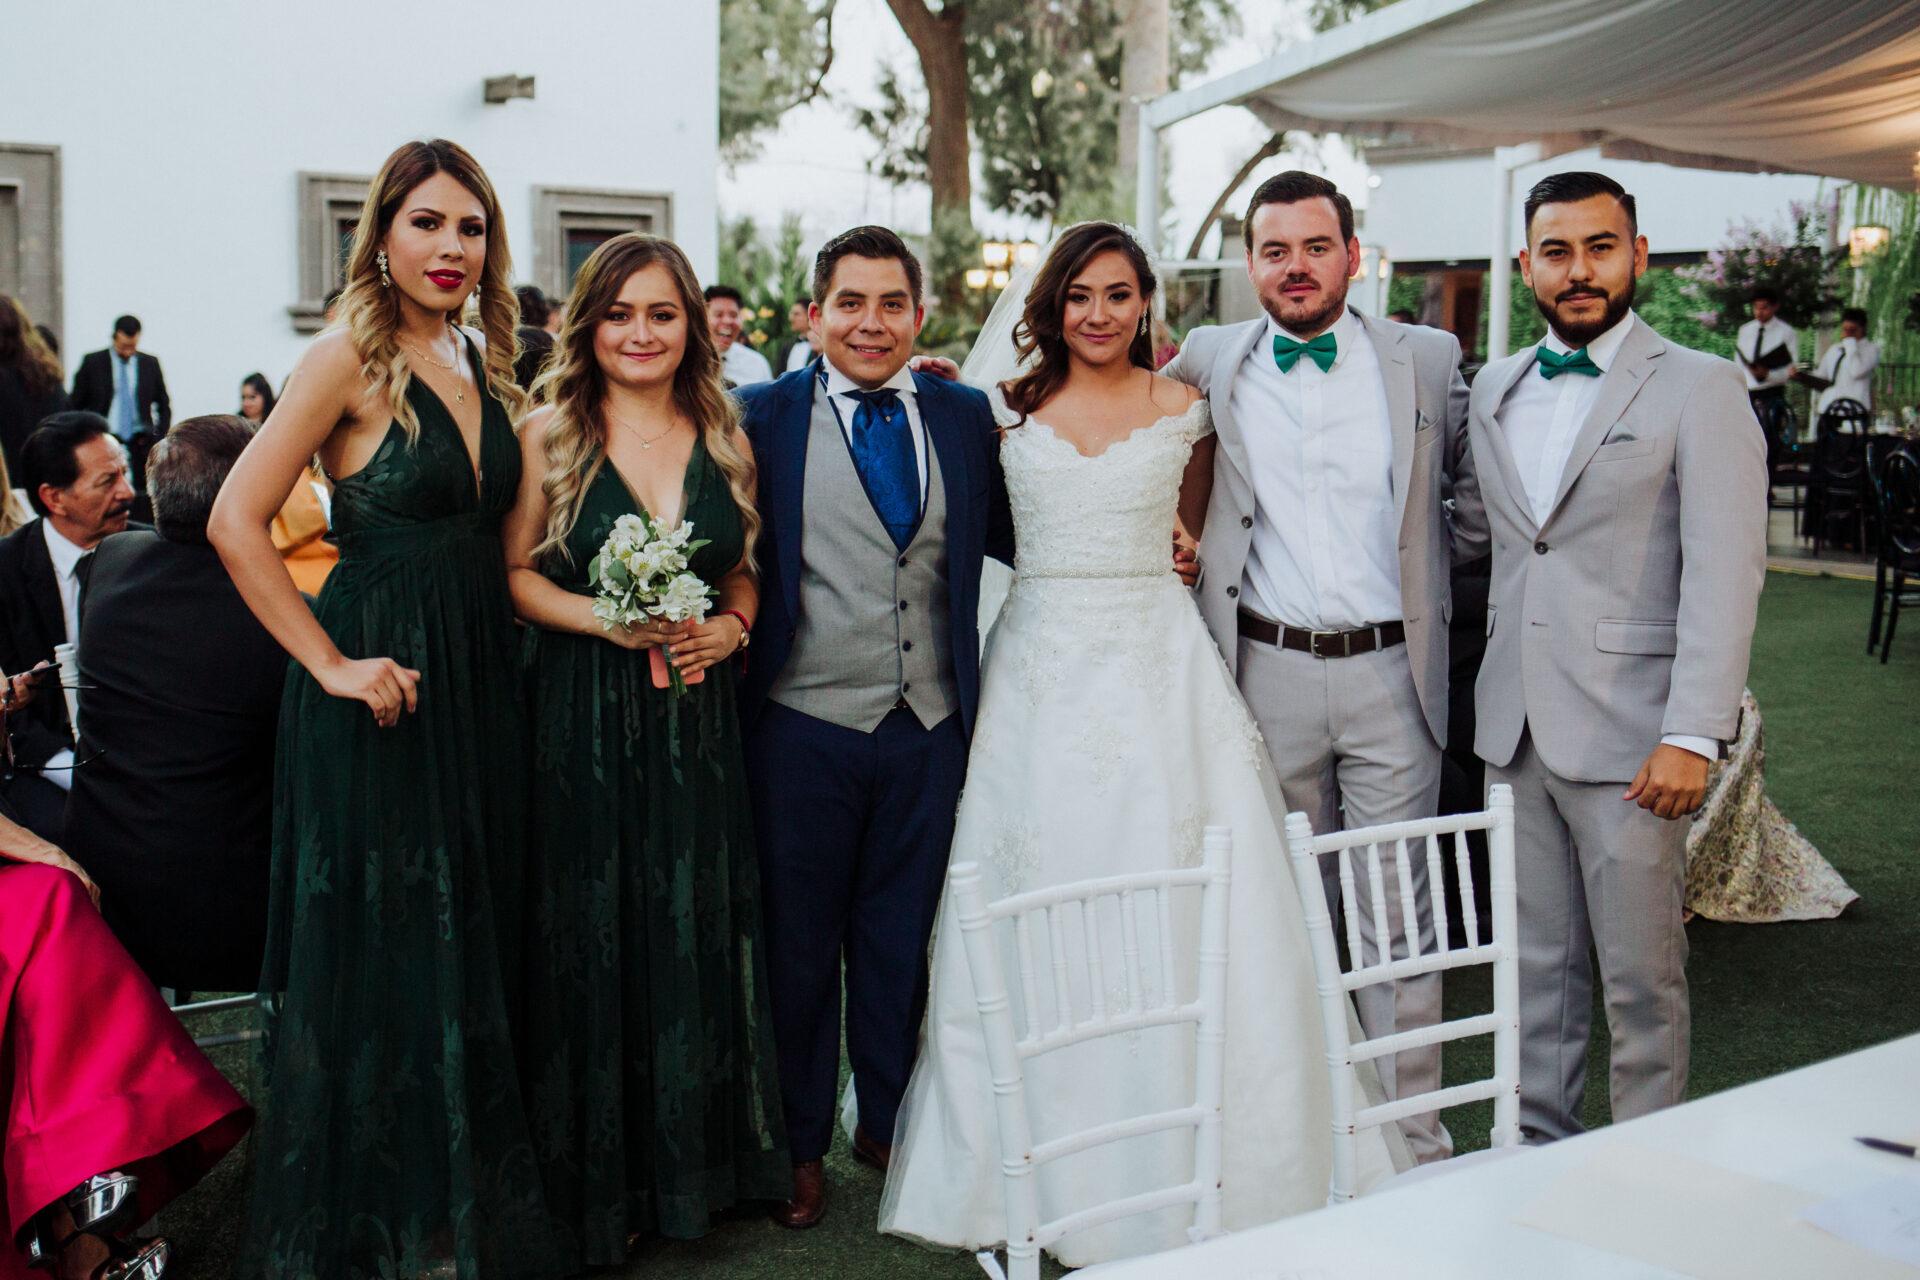 javier_noriega_fotografo_bodas_torreon_coahuila_zacatecas_wedding_photographer38a